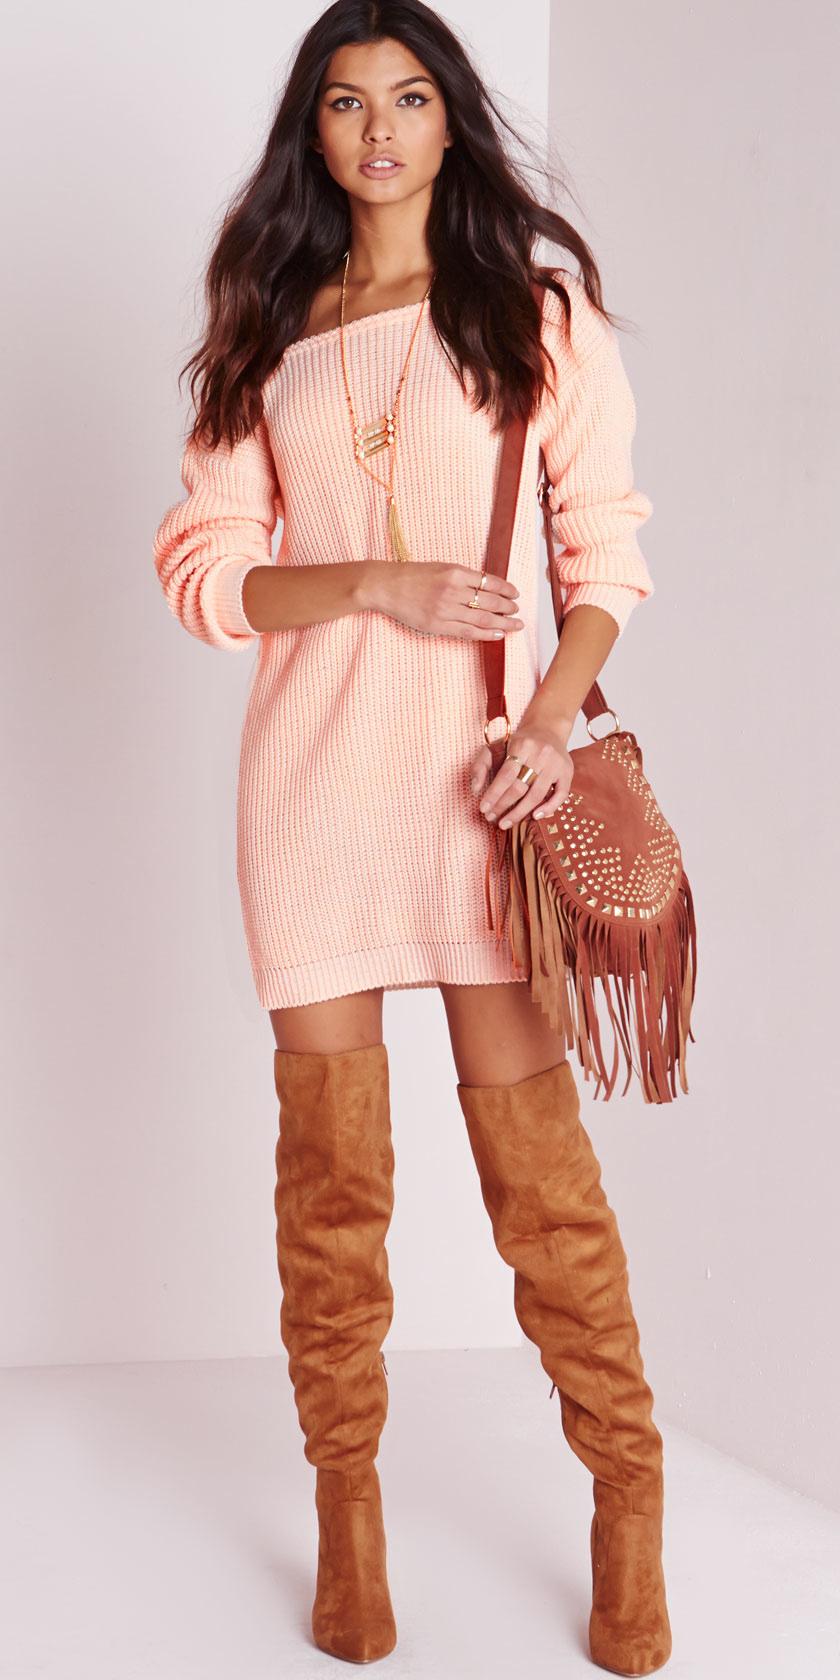 peach-dress-sweater-orange-dress-fringe-cognac-shoe-boots-otk-necklace-pend-brun-fall-winter-weekend.jpeg